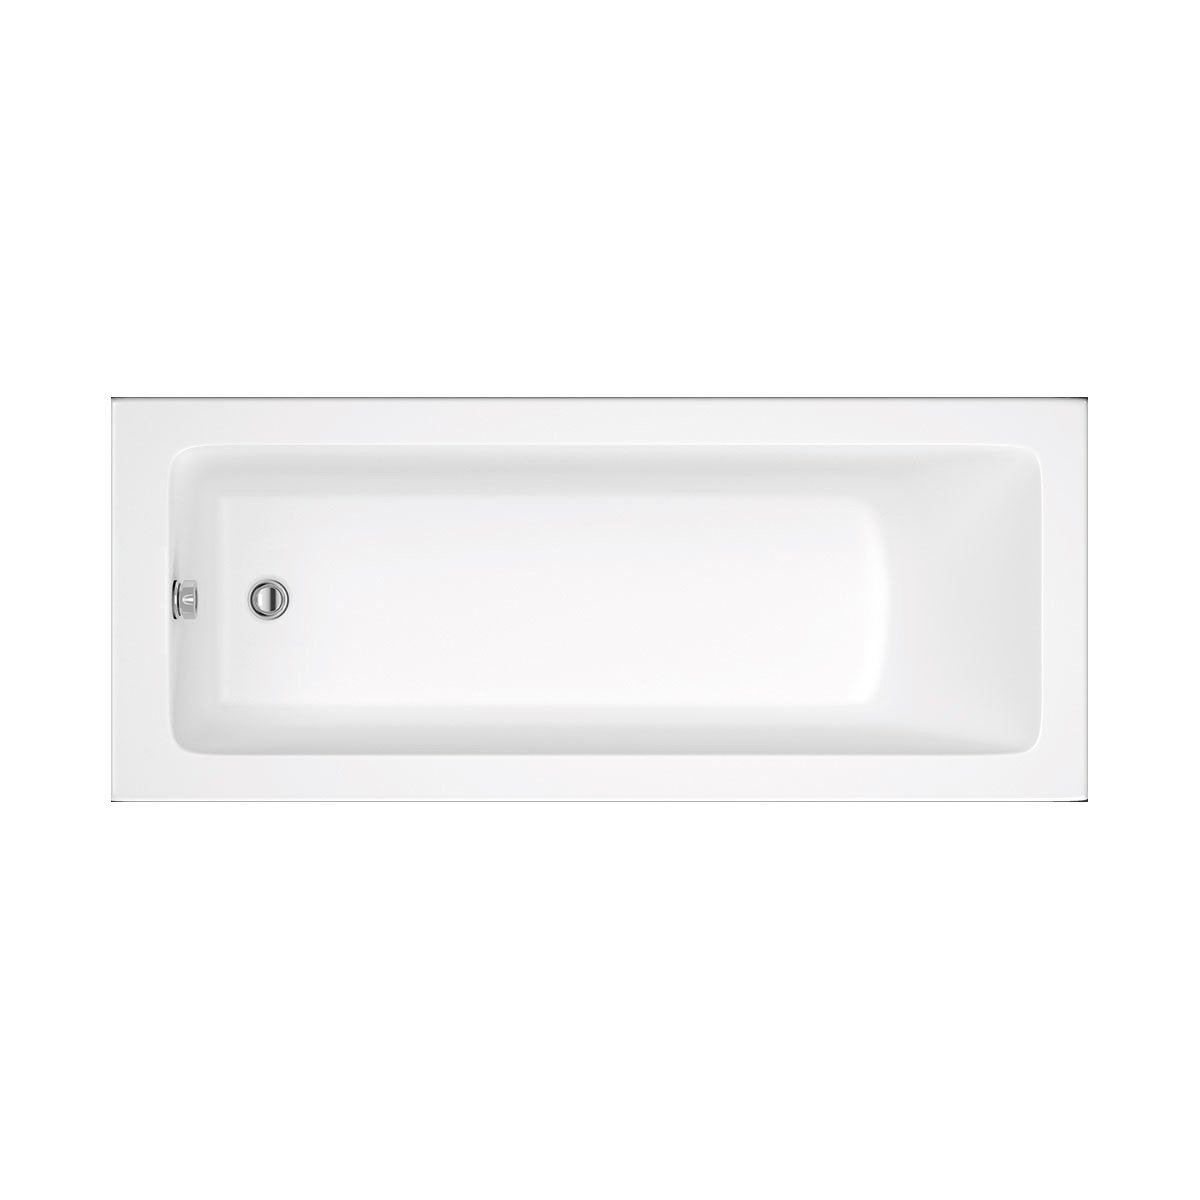 RAK Karla Single Ended Bath 1700mm